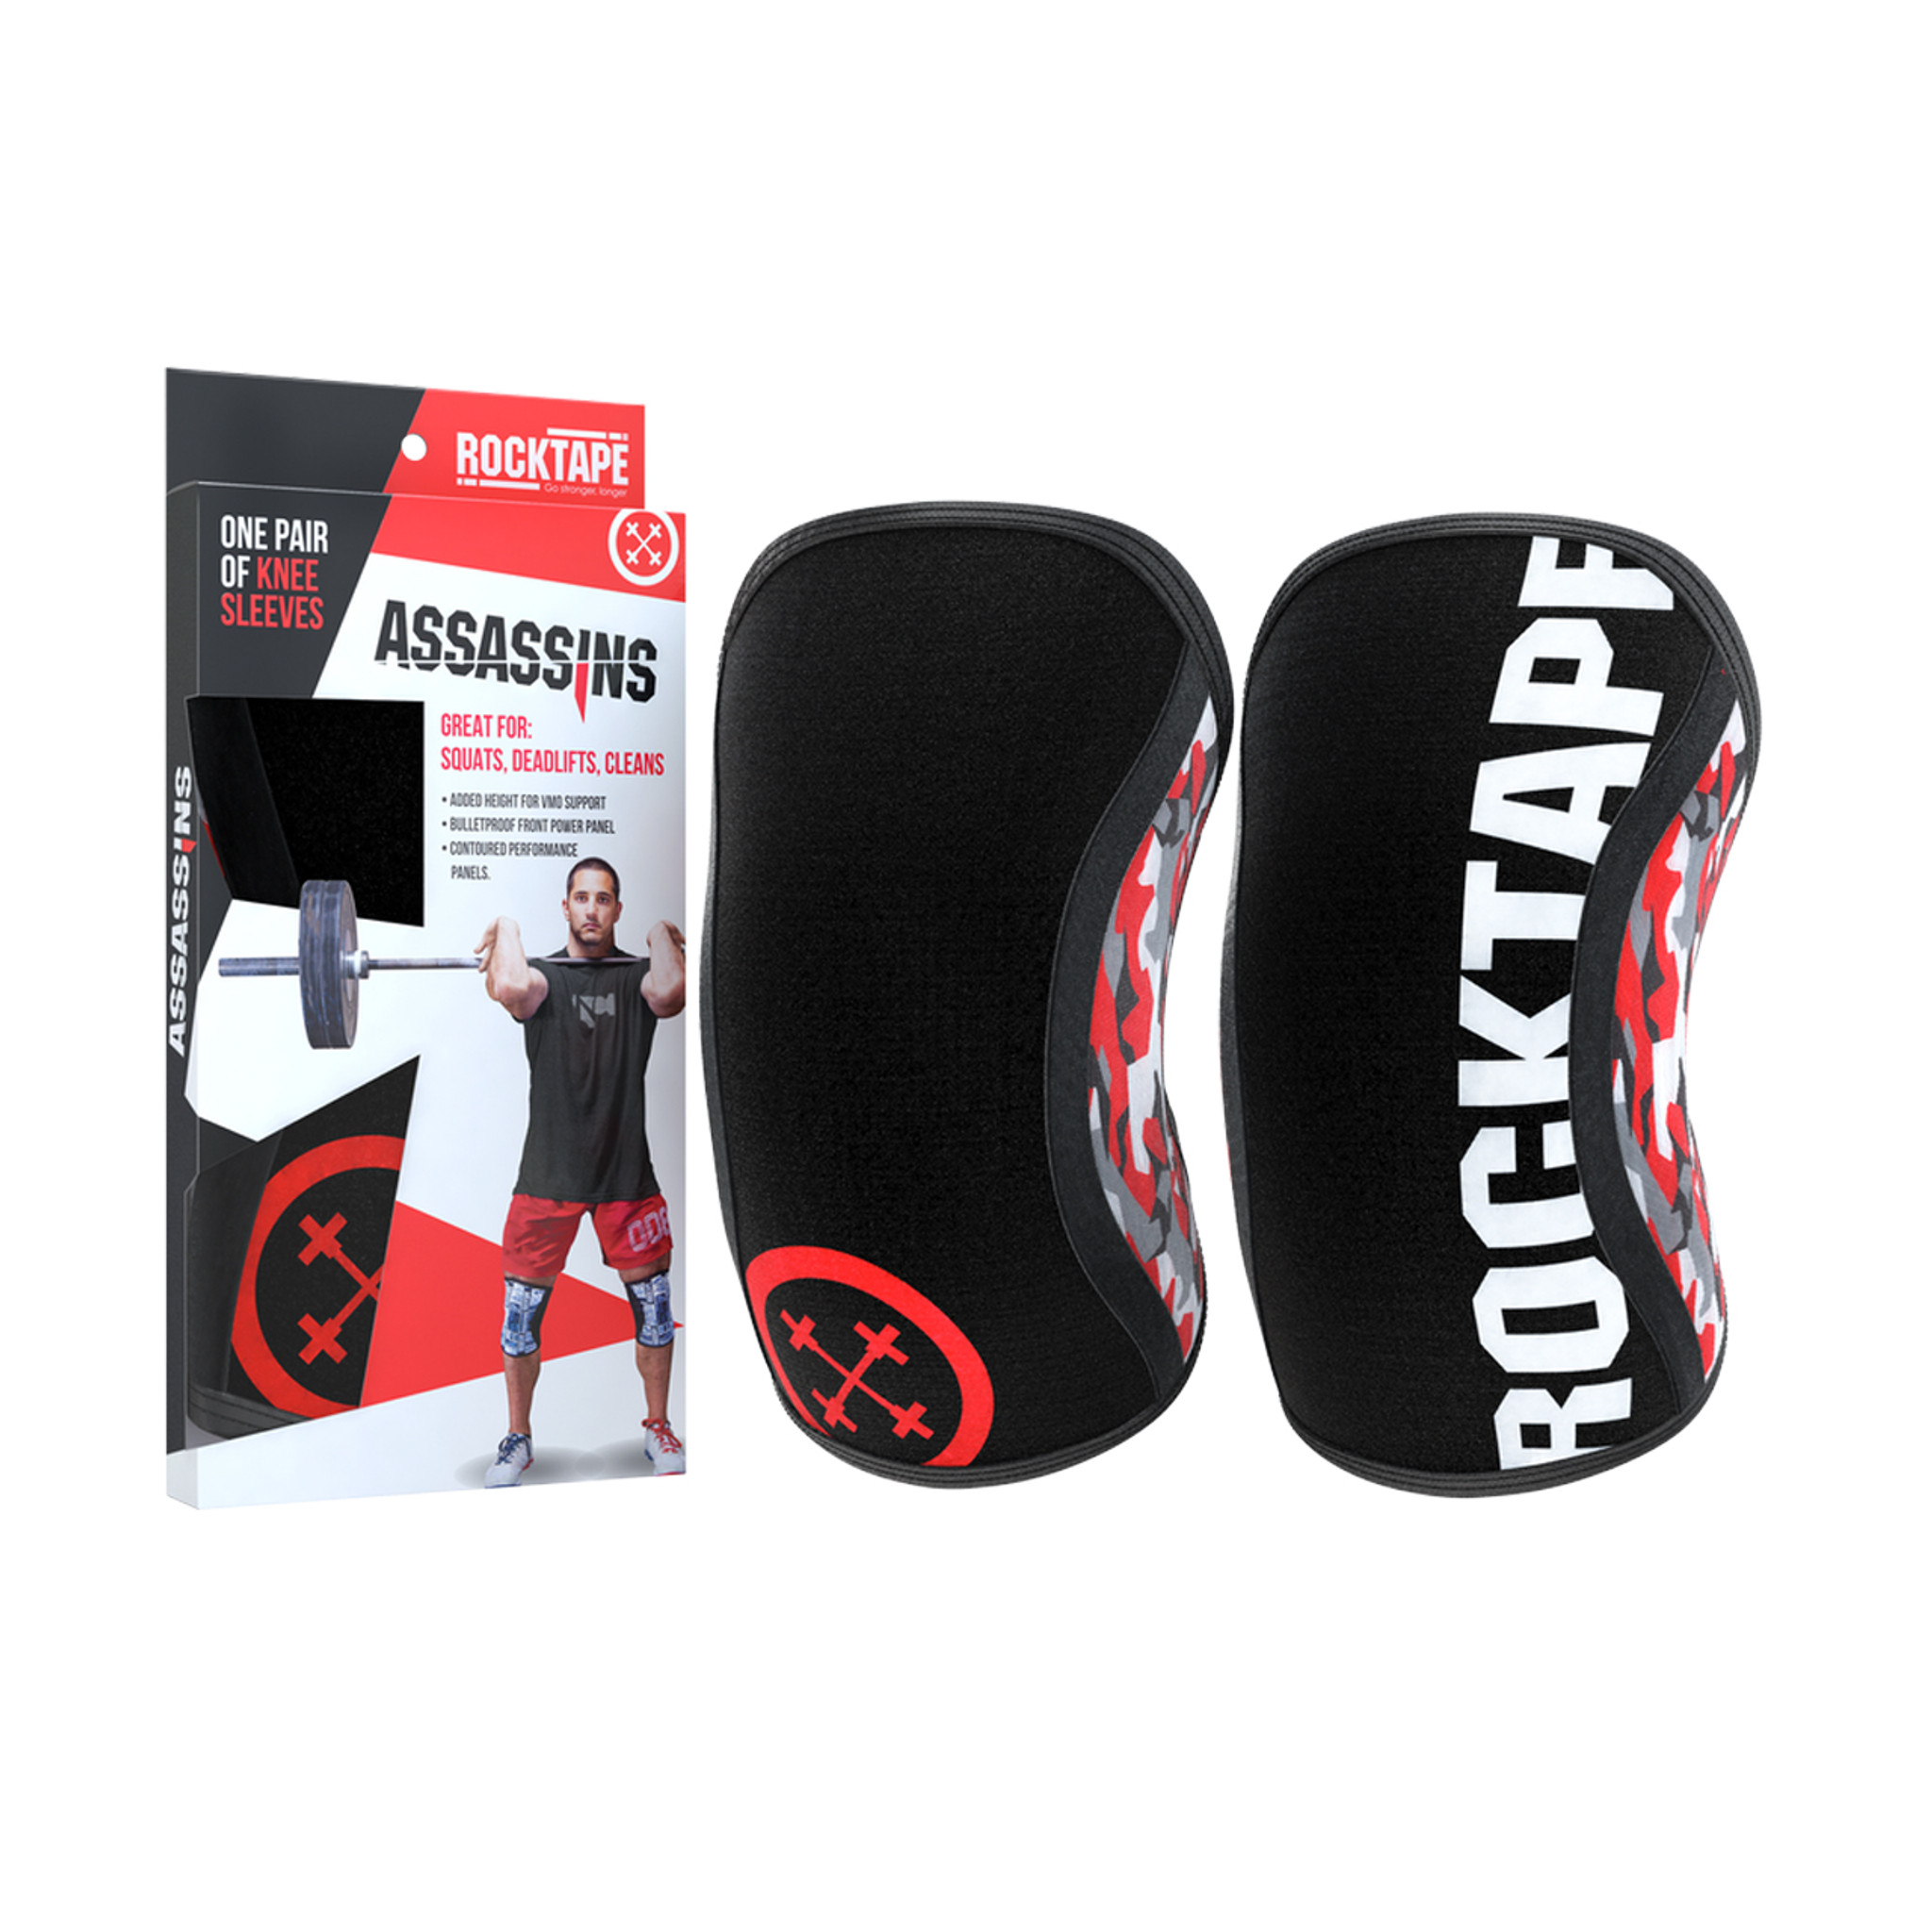 94ee87d06b RockTape Assassins Knee Sleeves - Red Camo